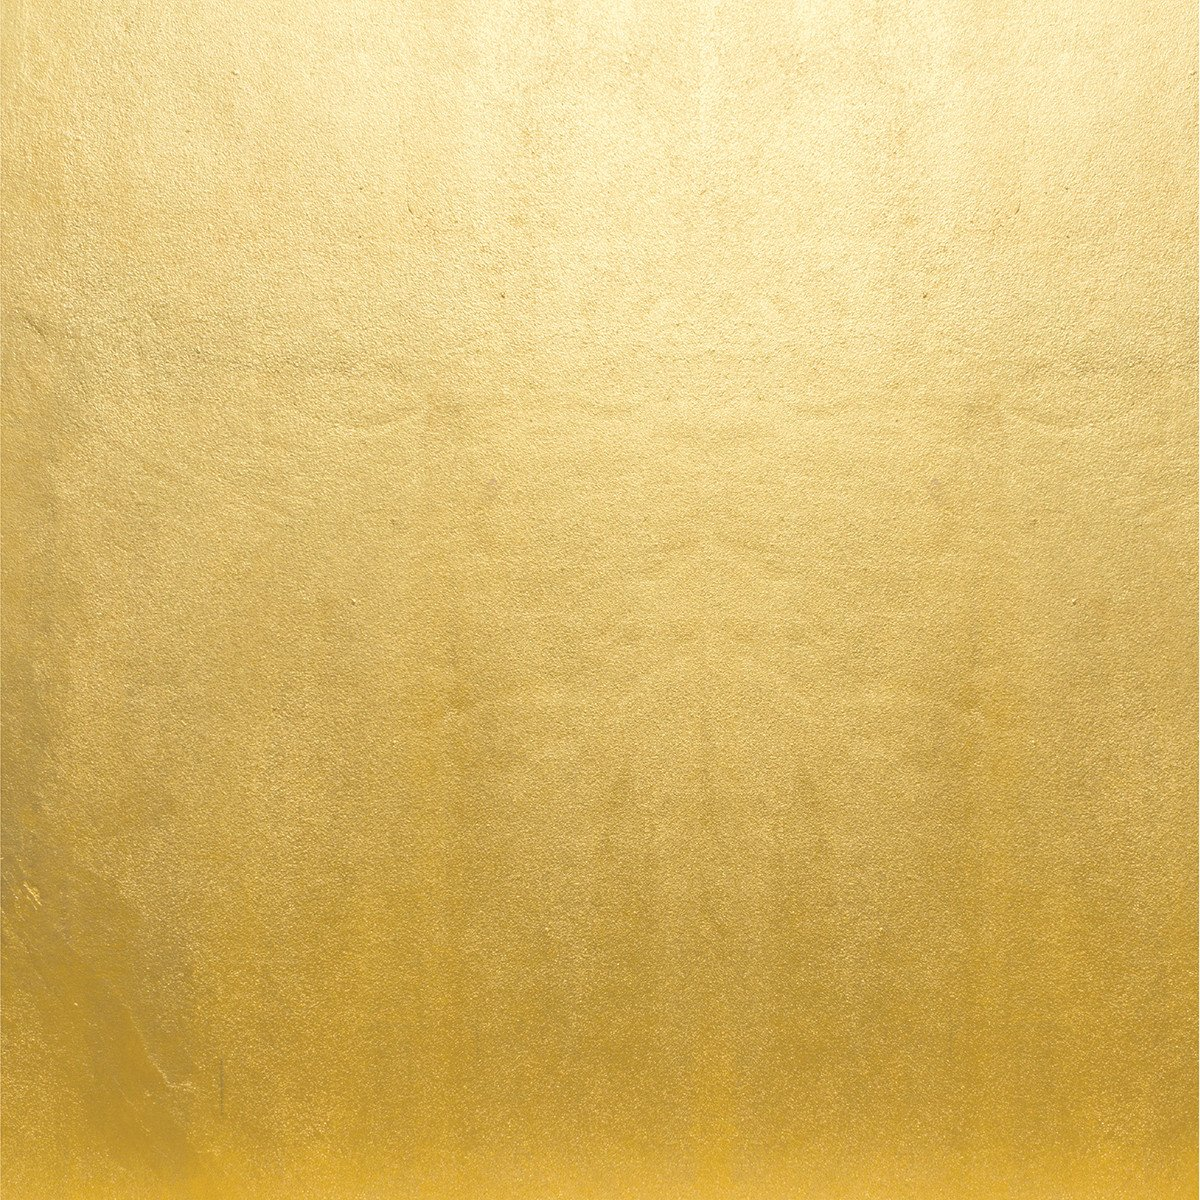 Free Gold Foil Texture Music Gold Foil 12x12 Basics